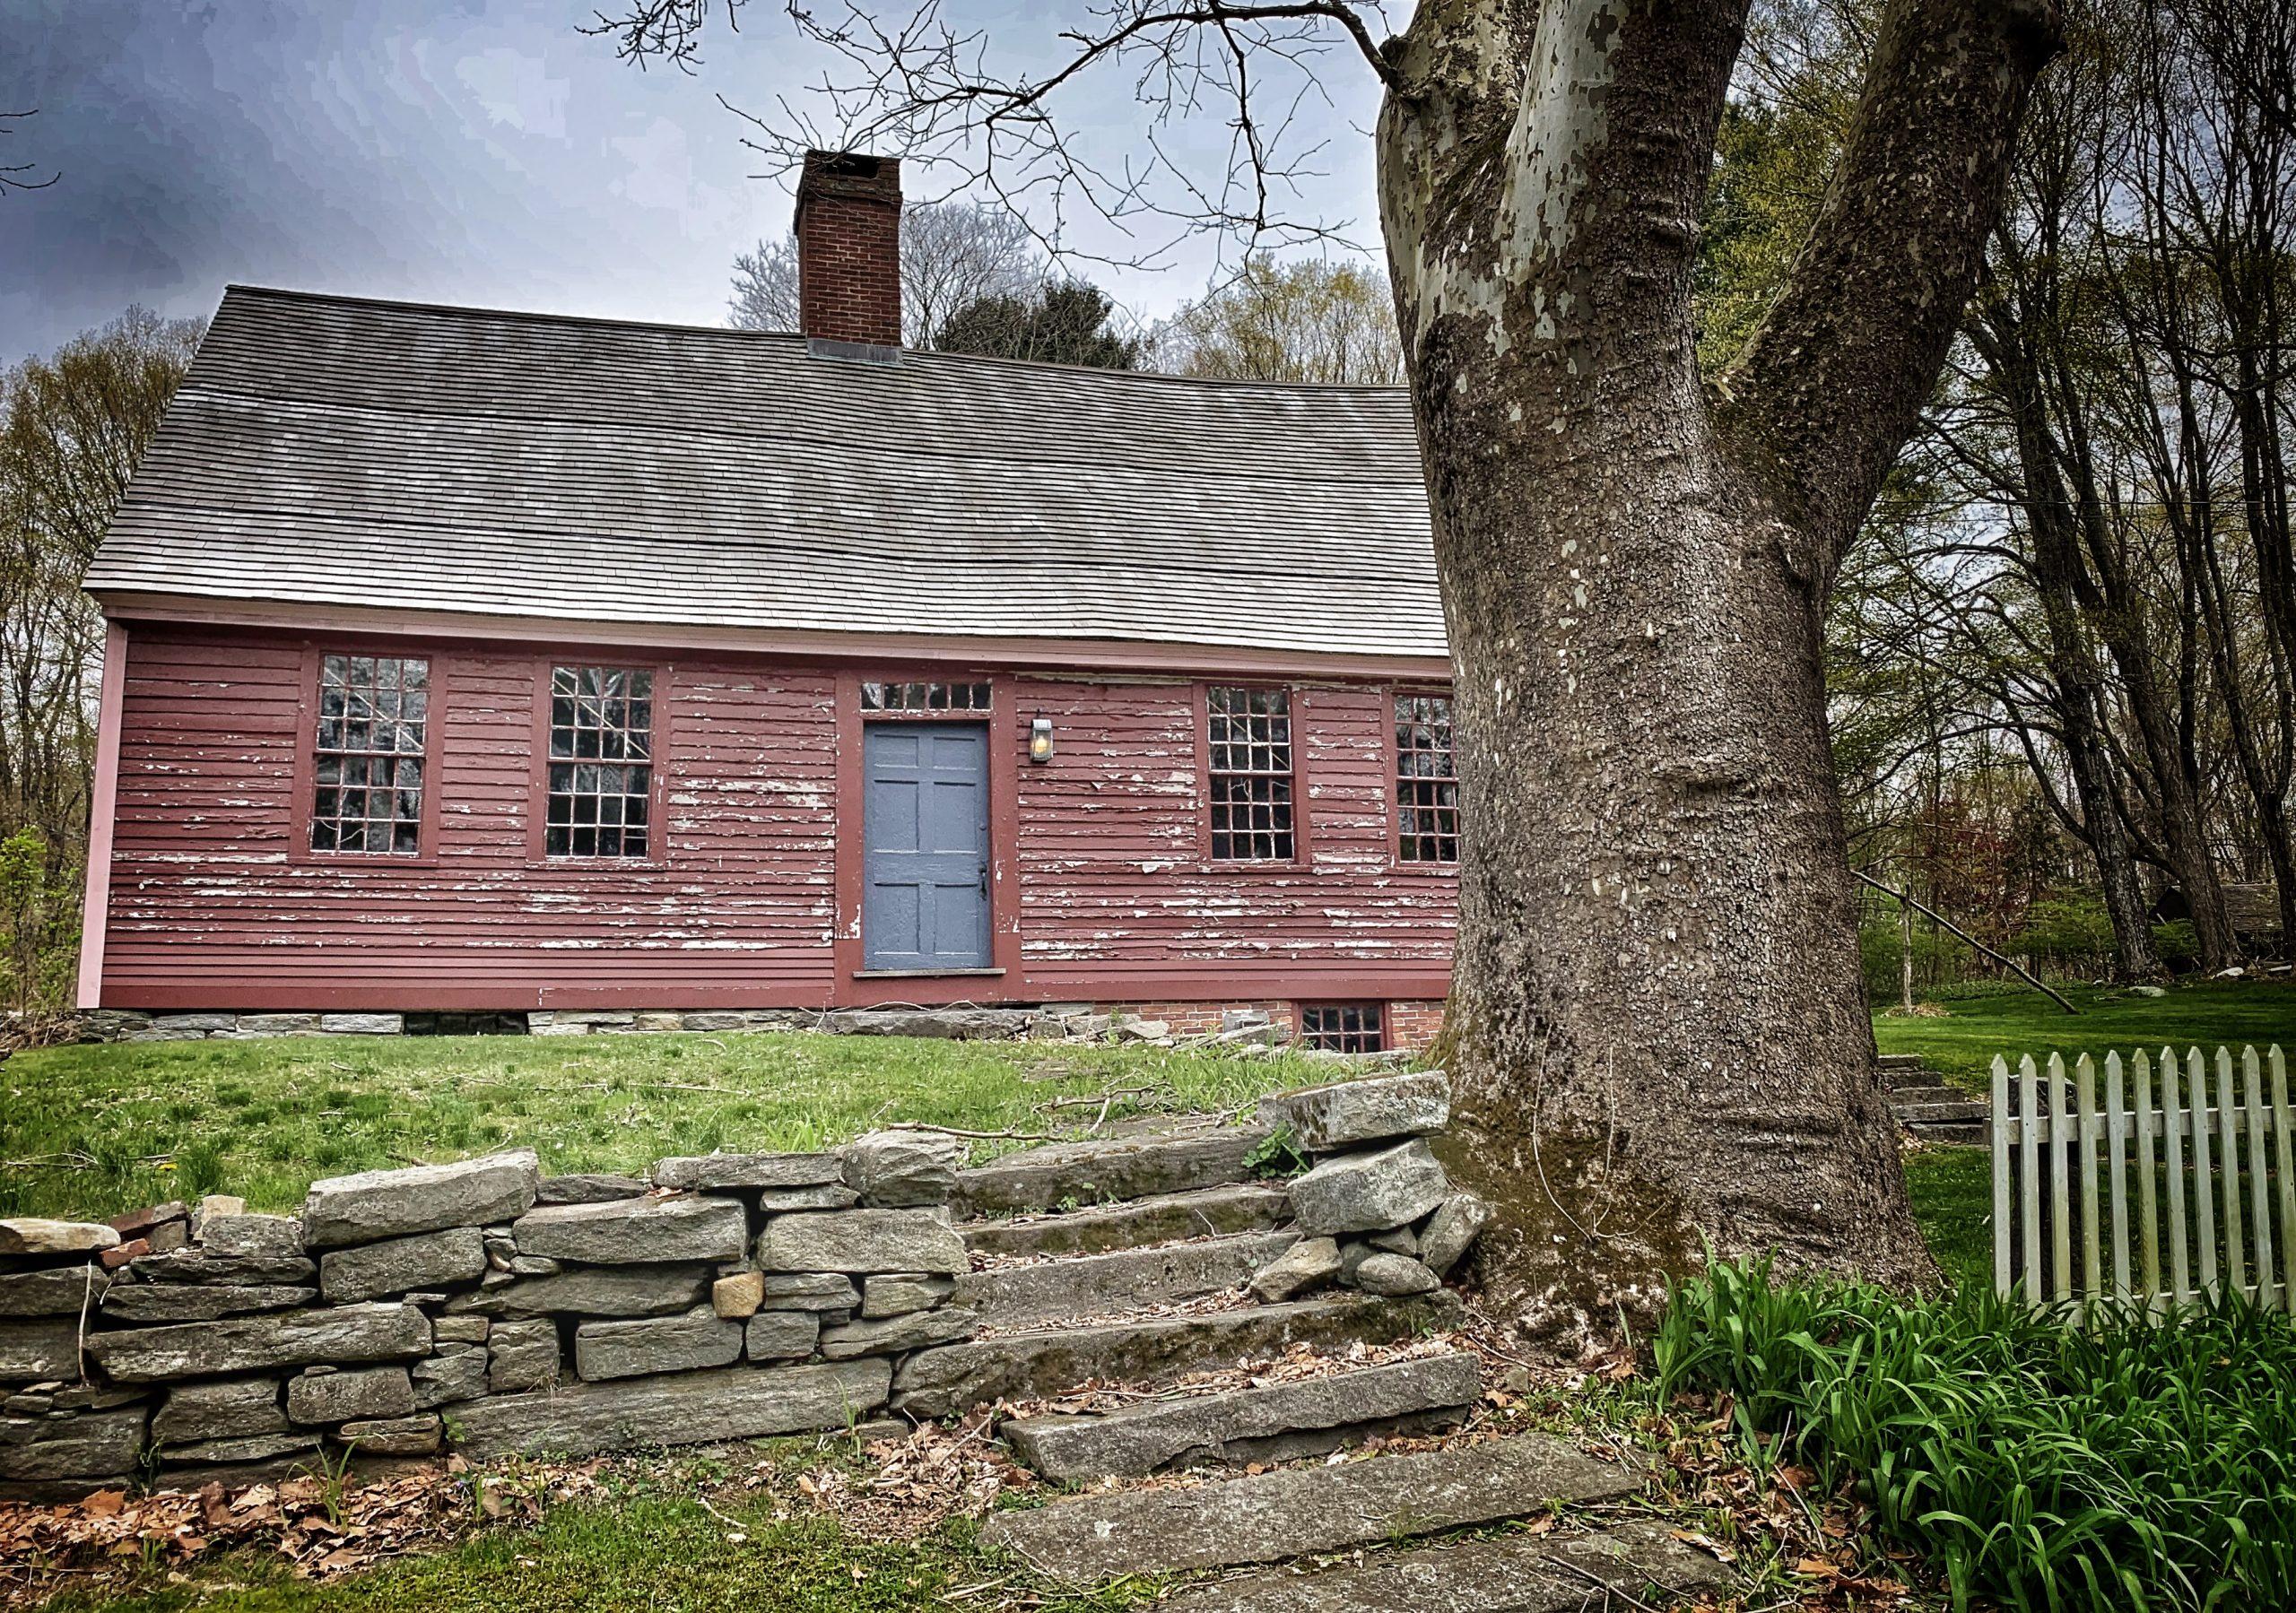 The haunted Daniel Benton Homestead in Tolland, Connecticut.